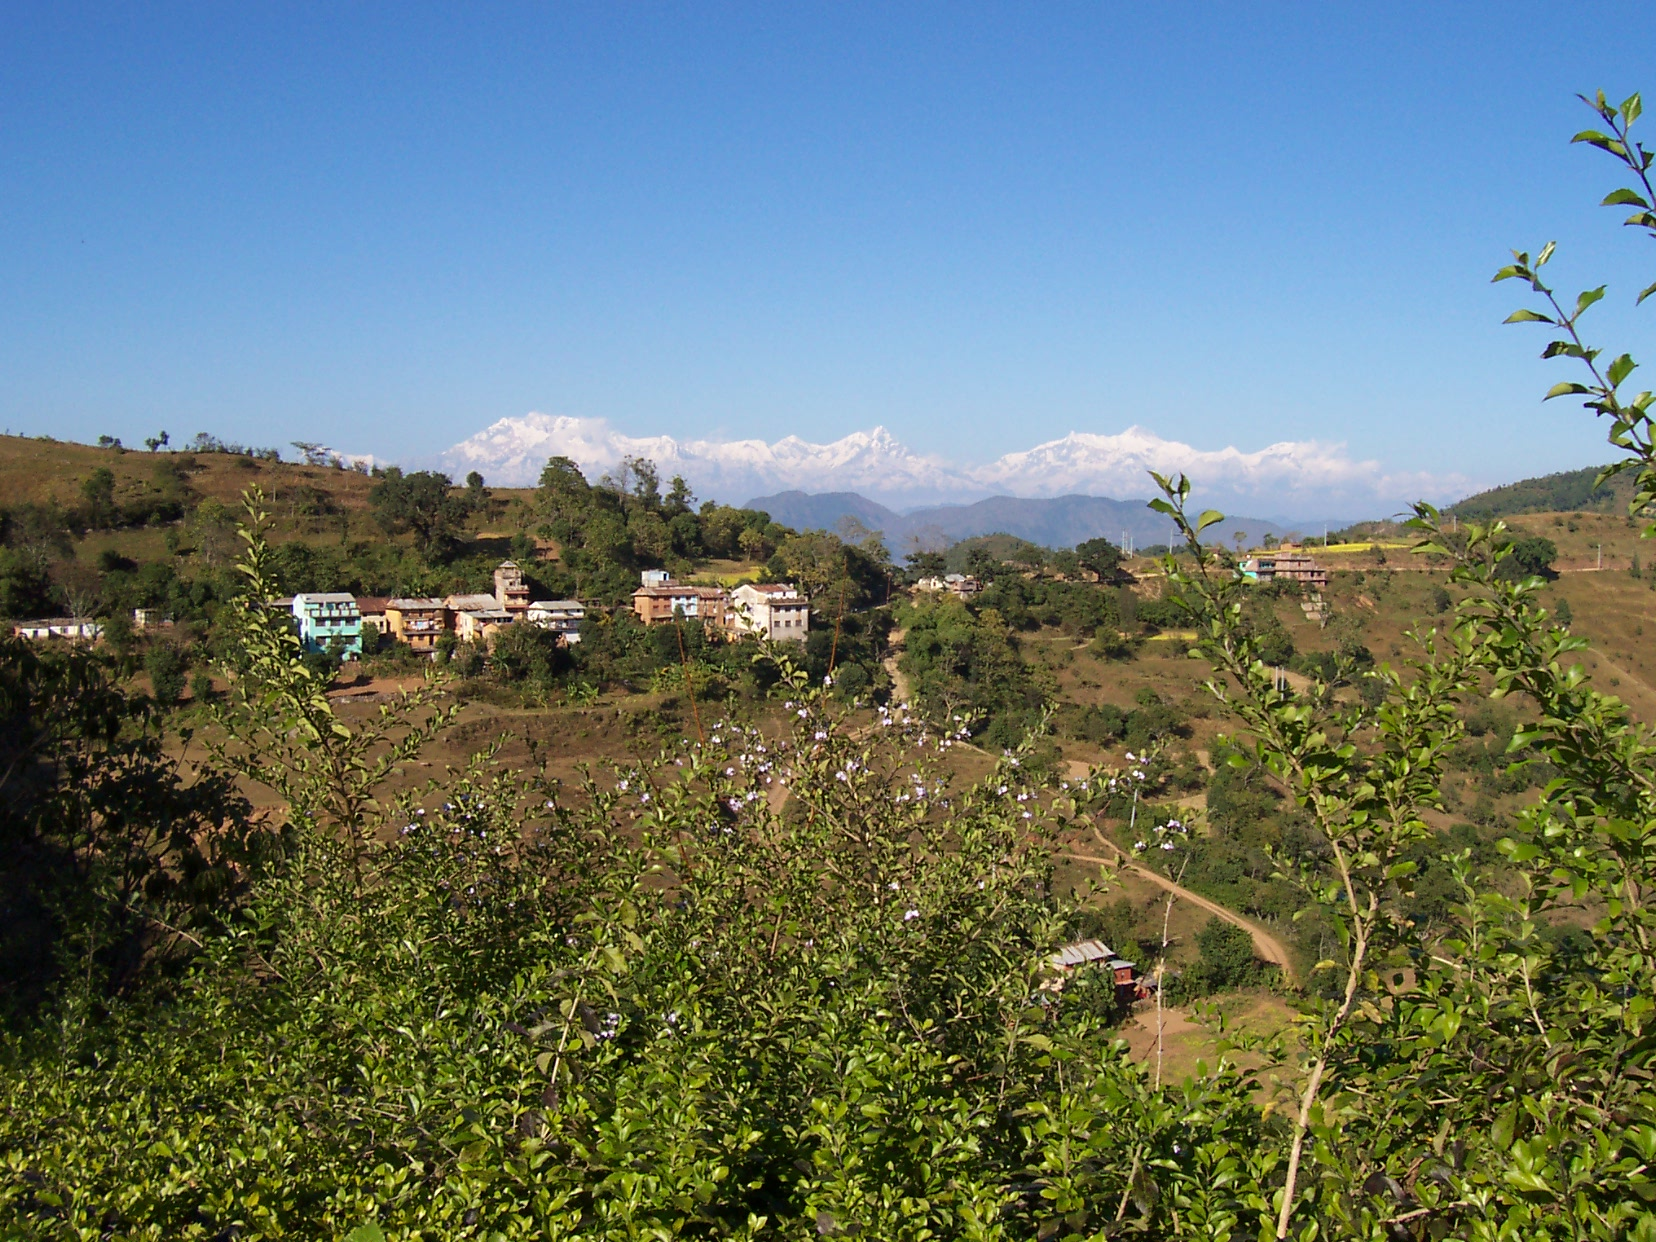 annet village in the hills green plants